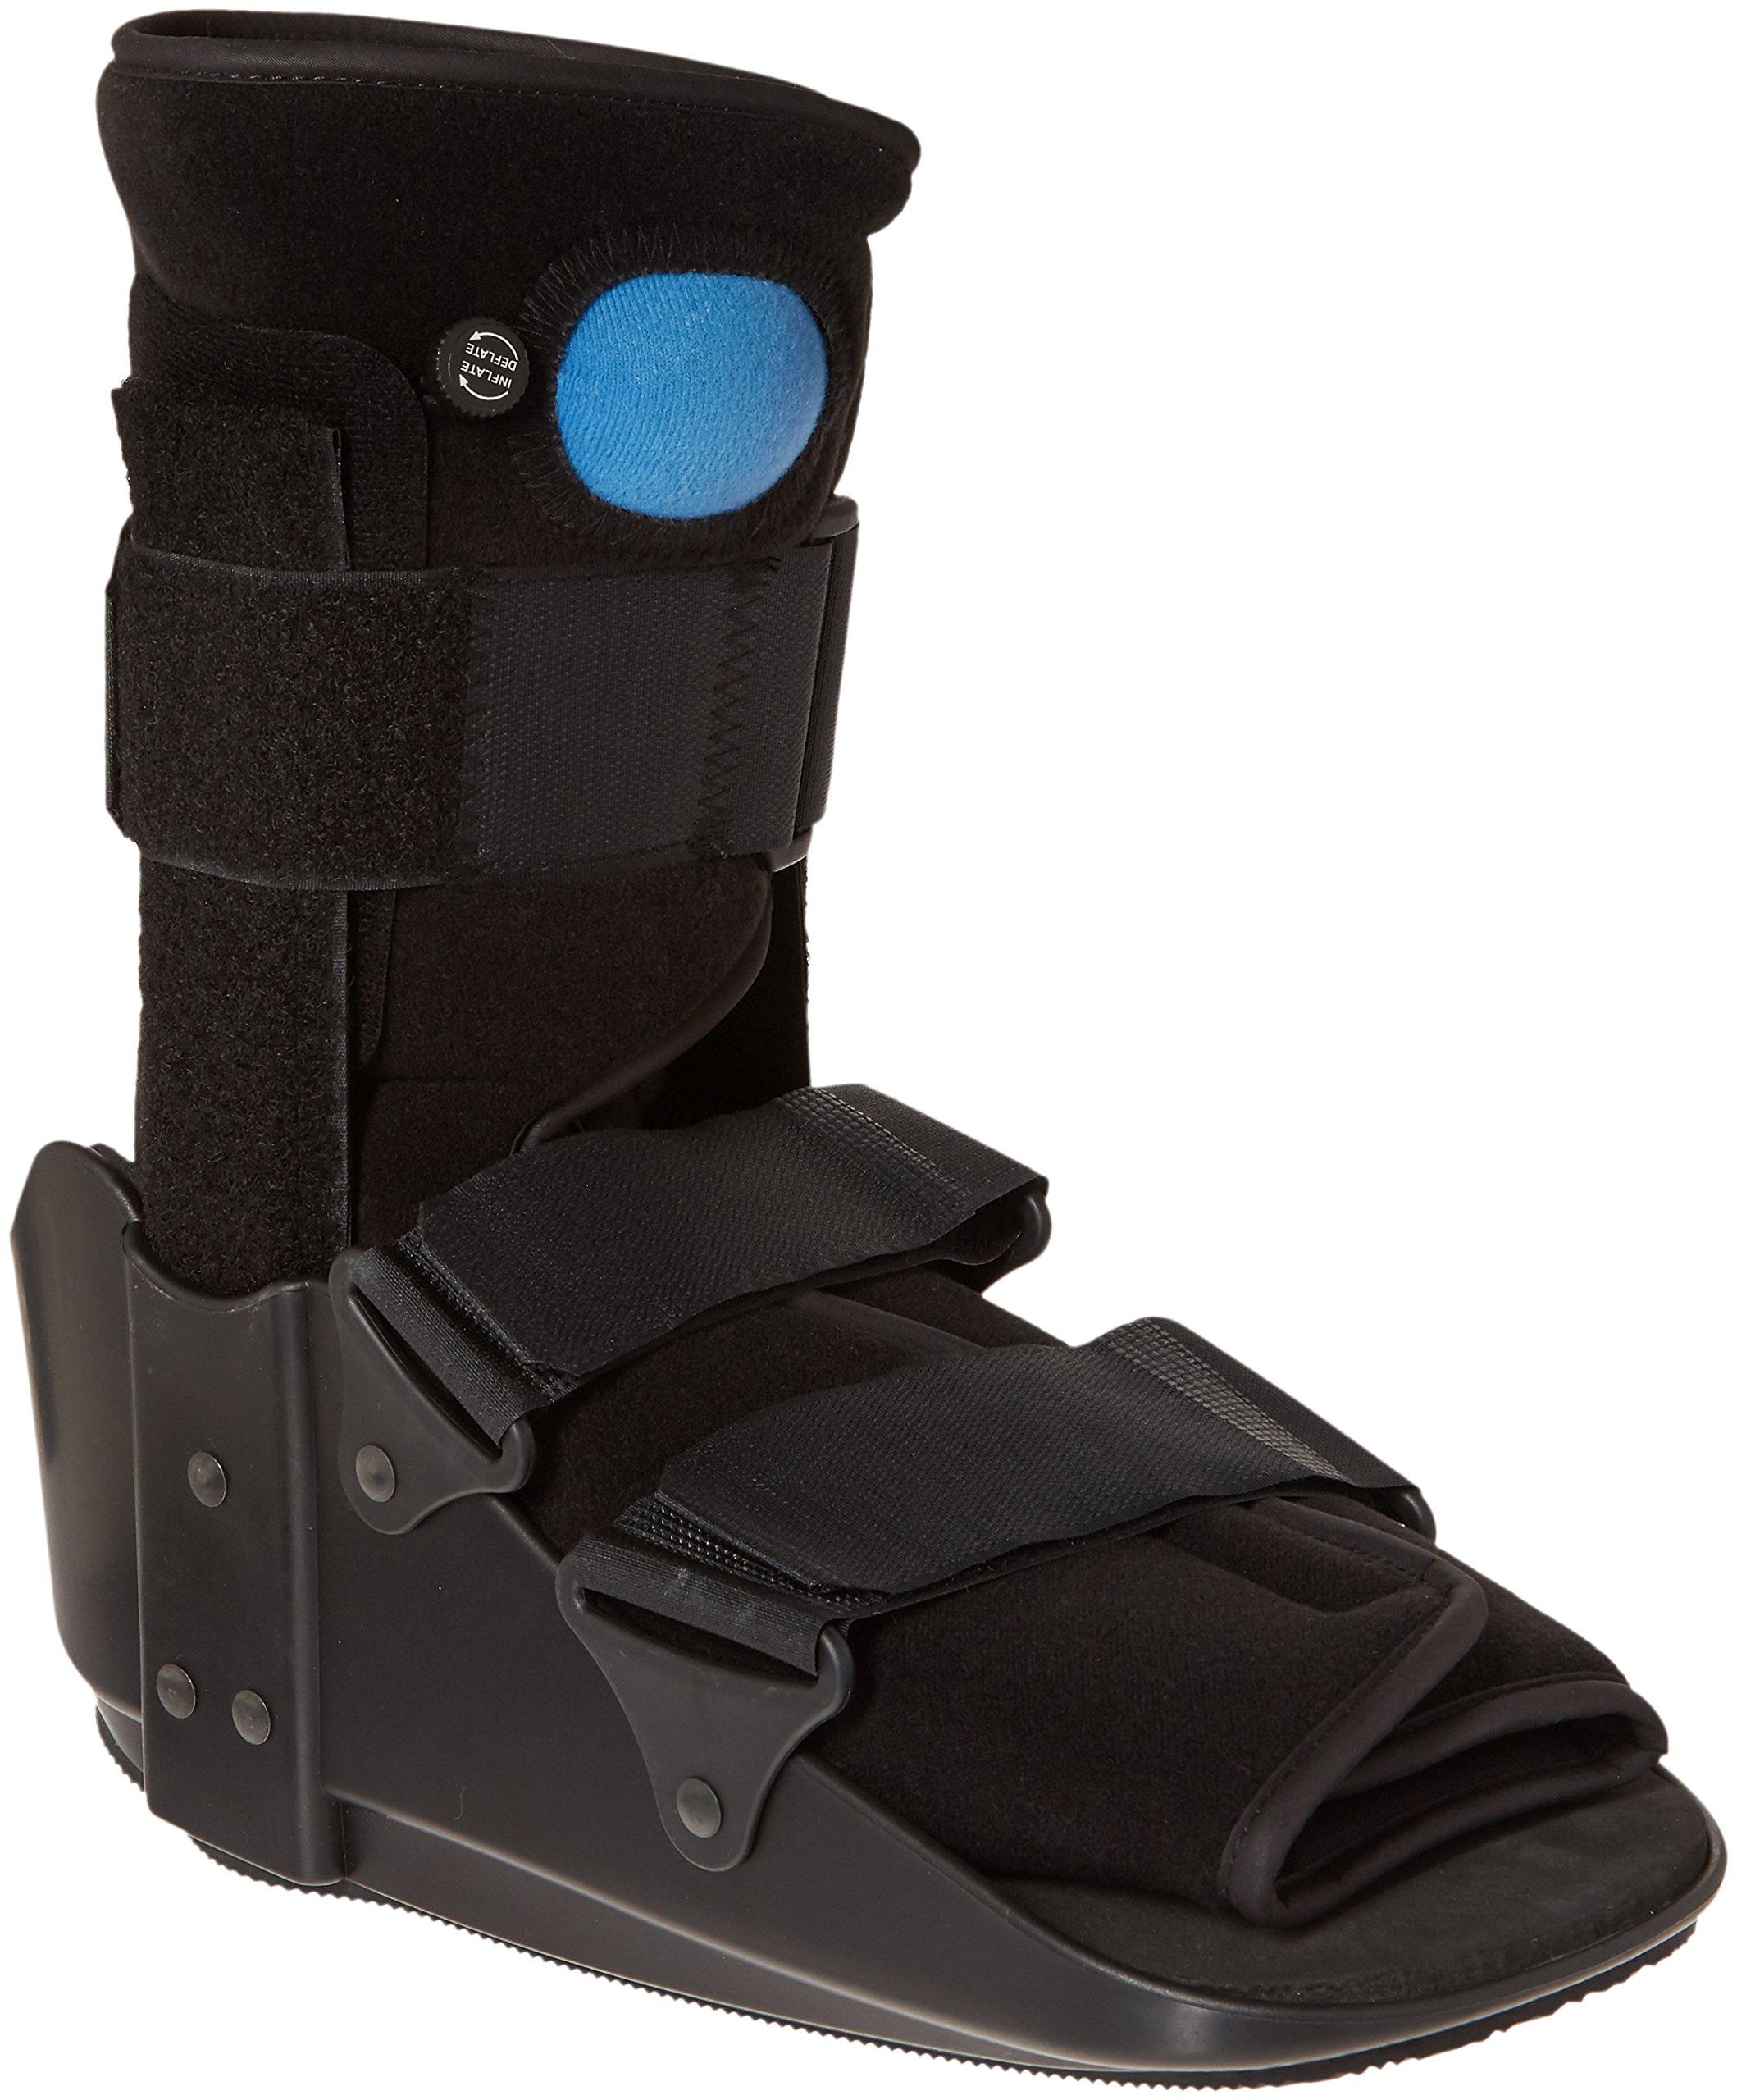 OTC Short Leg Adjustable Air Cast Low Top Walker Boot, Black, Large by OTC